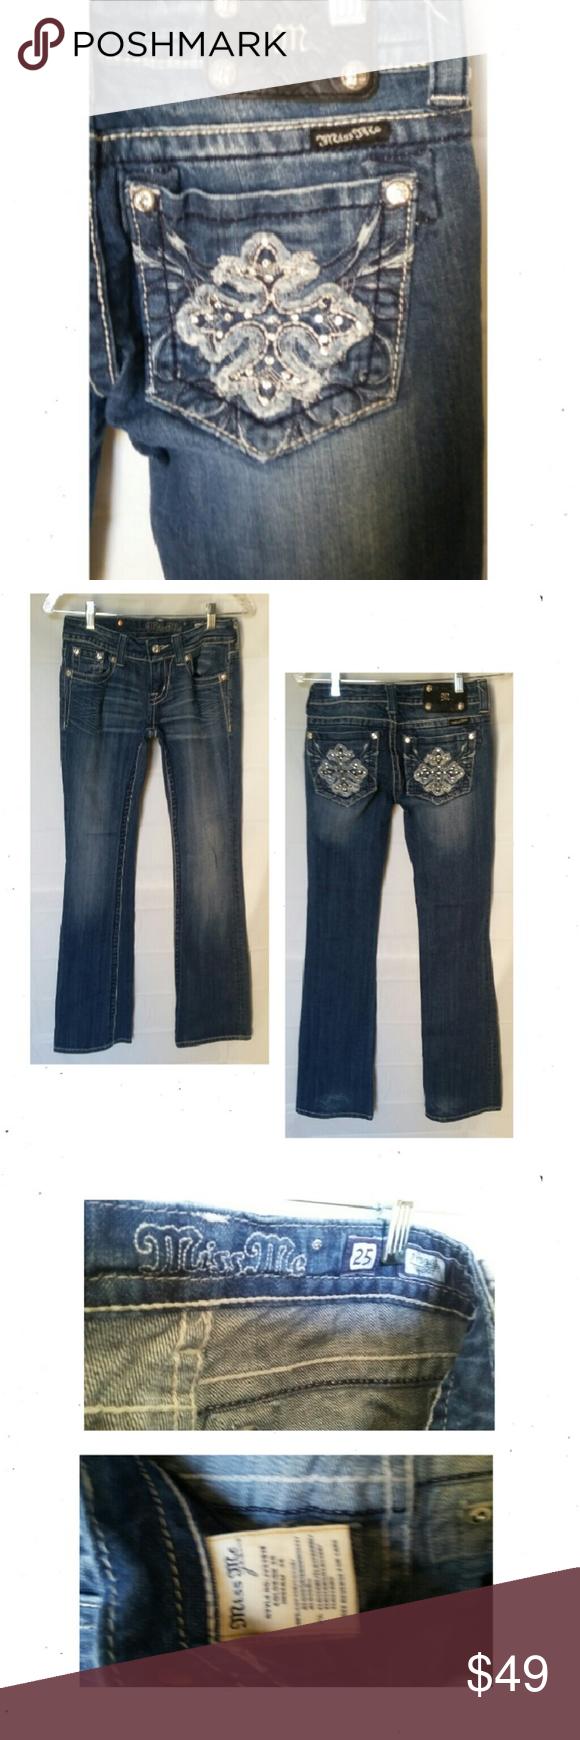 "Miss Me Low Rise Boot Cut Miss Me Boot Cut Low Rise Jeans. Size 27. ID JY53938  L40"" R7"" I33"" EUC (MM2) Miss Me Jeans Boot Cut"